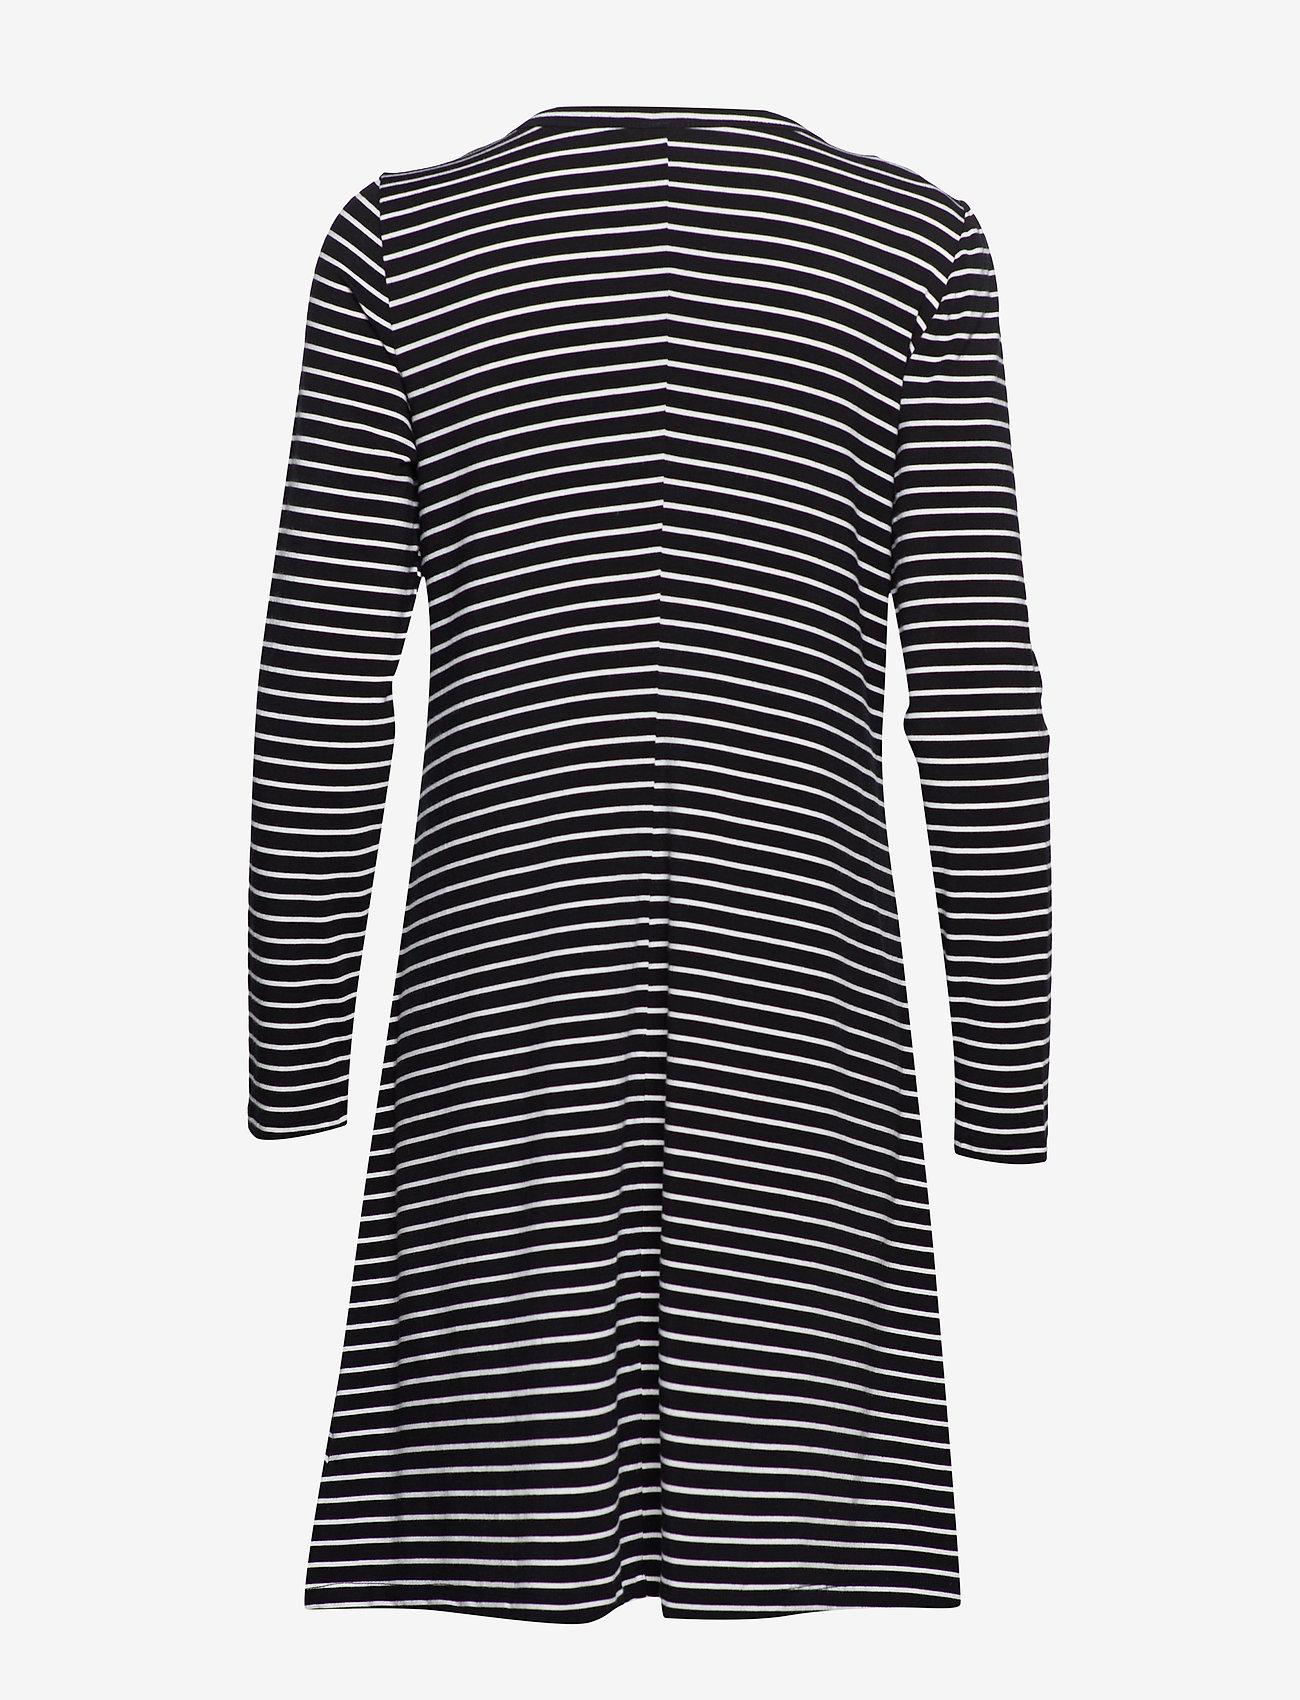 U-neck Swing Dress (Black/white Strp - J) (22.50 €) - GAP dqwGK